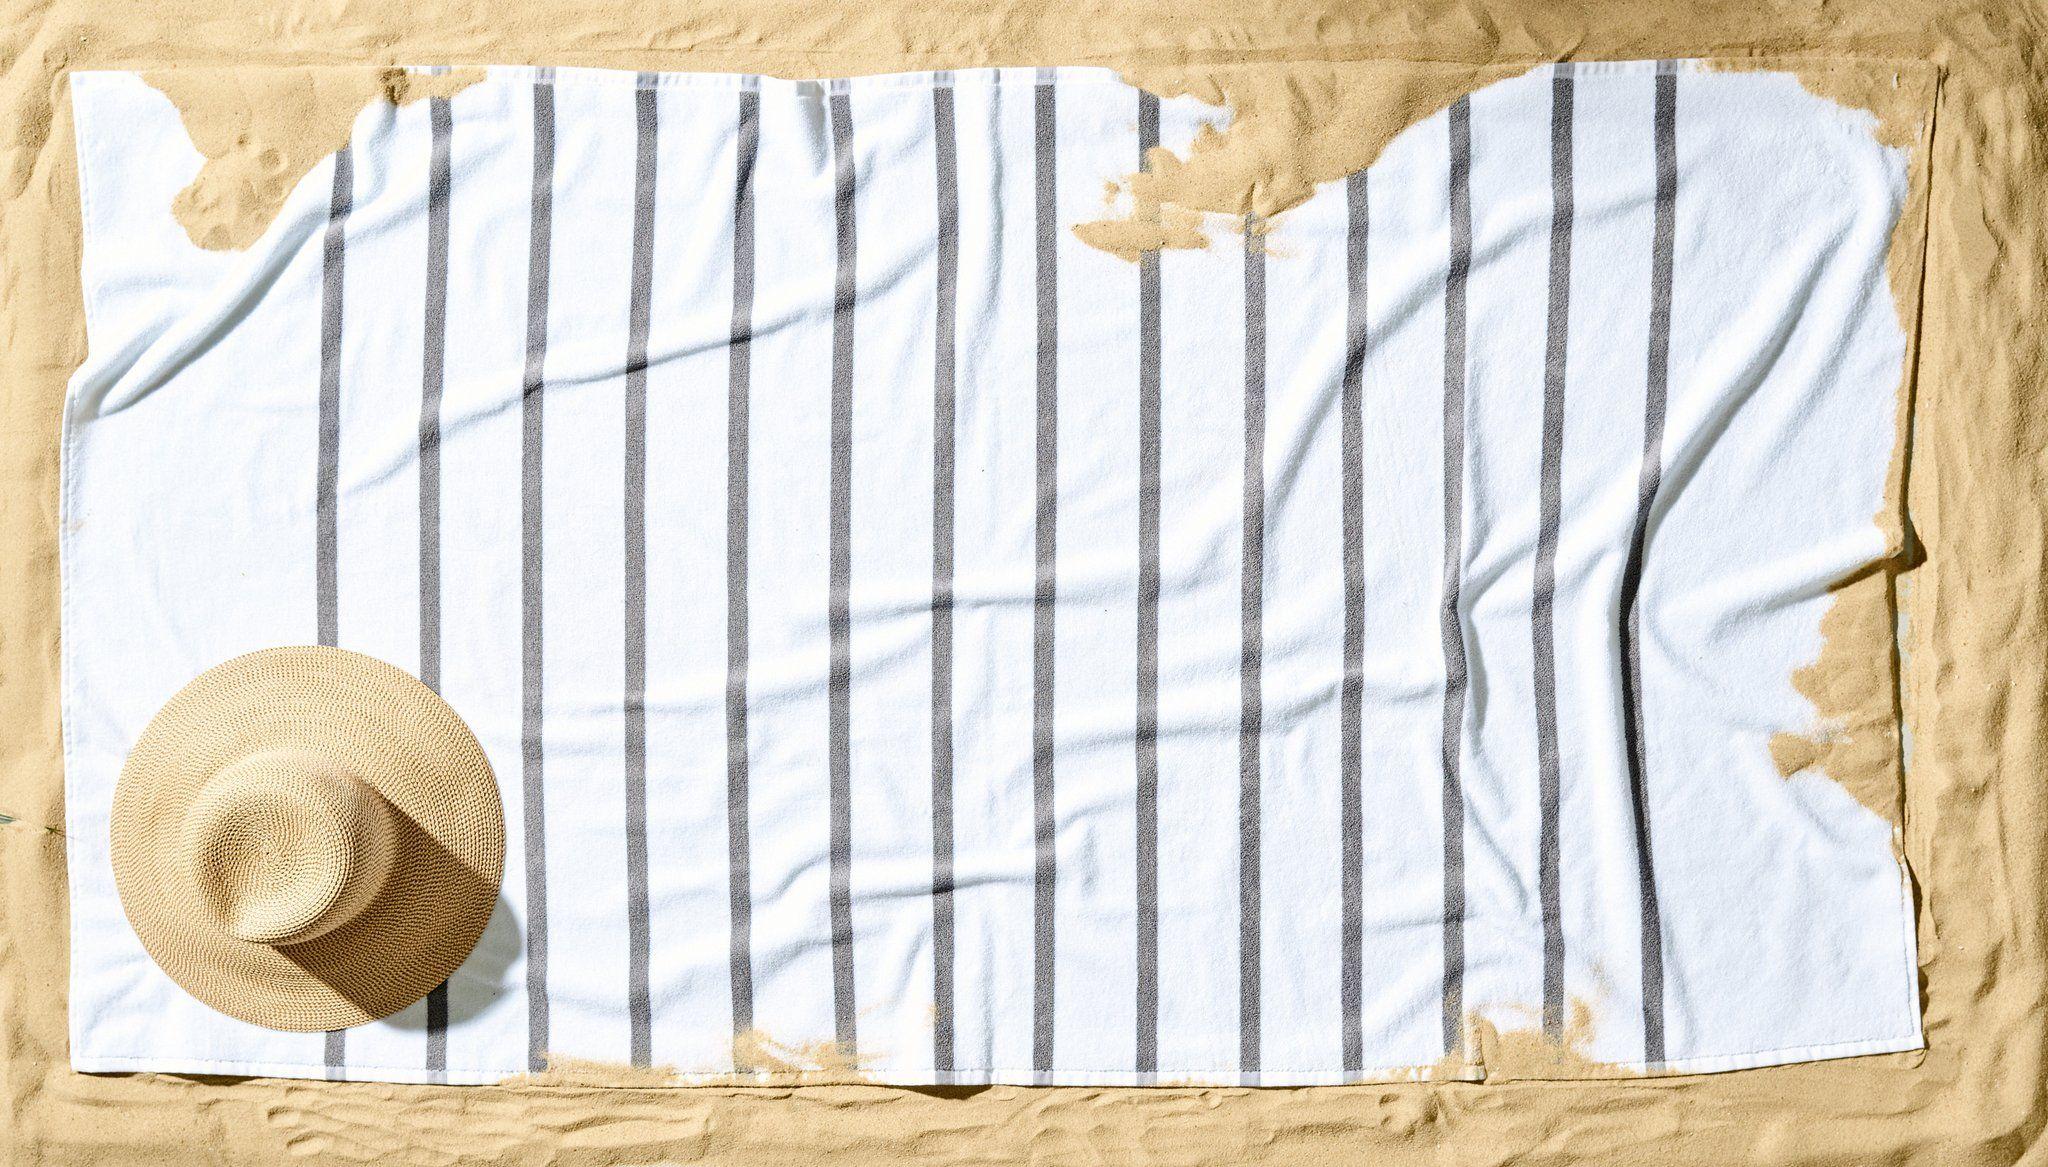 Beach Towel - Sunny Stripe | Designer beach towels, Beach ...